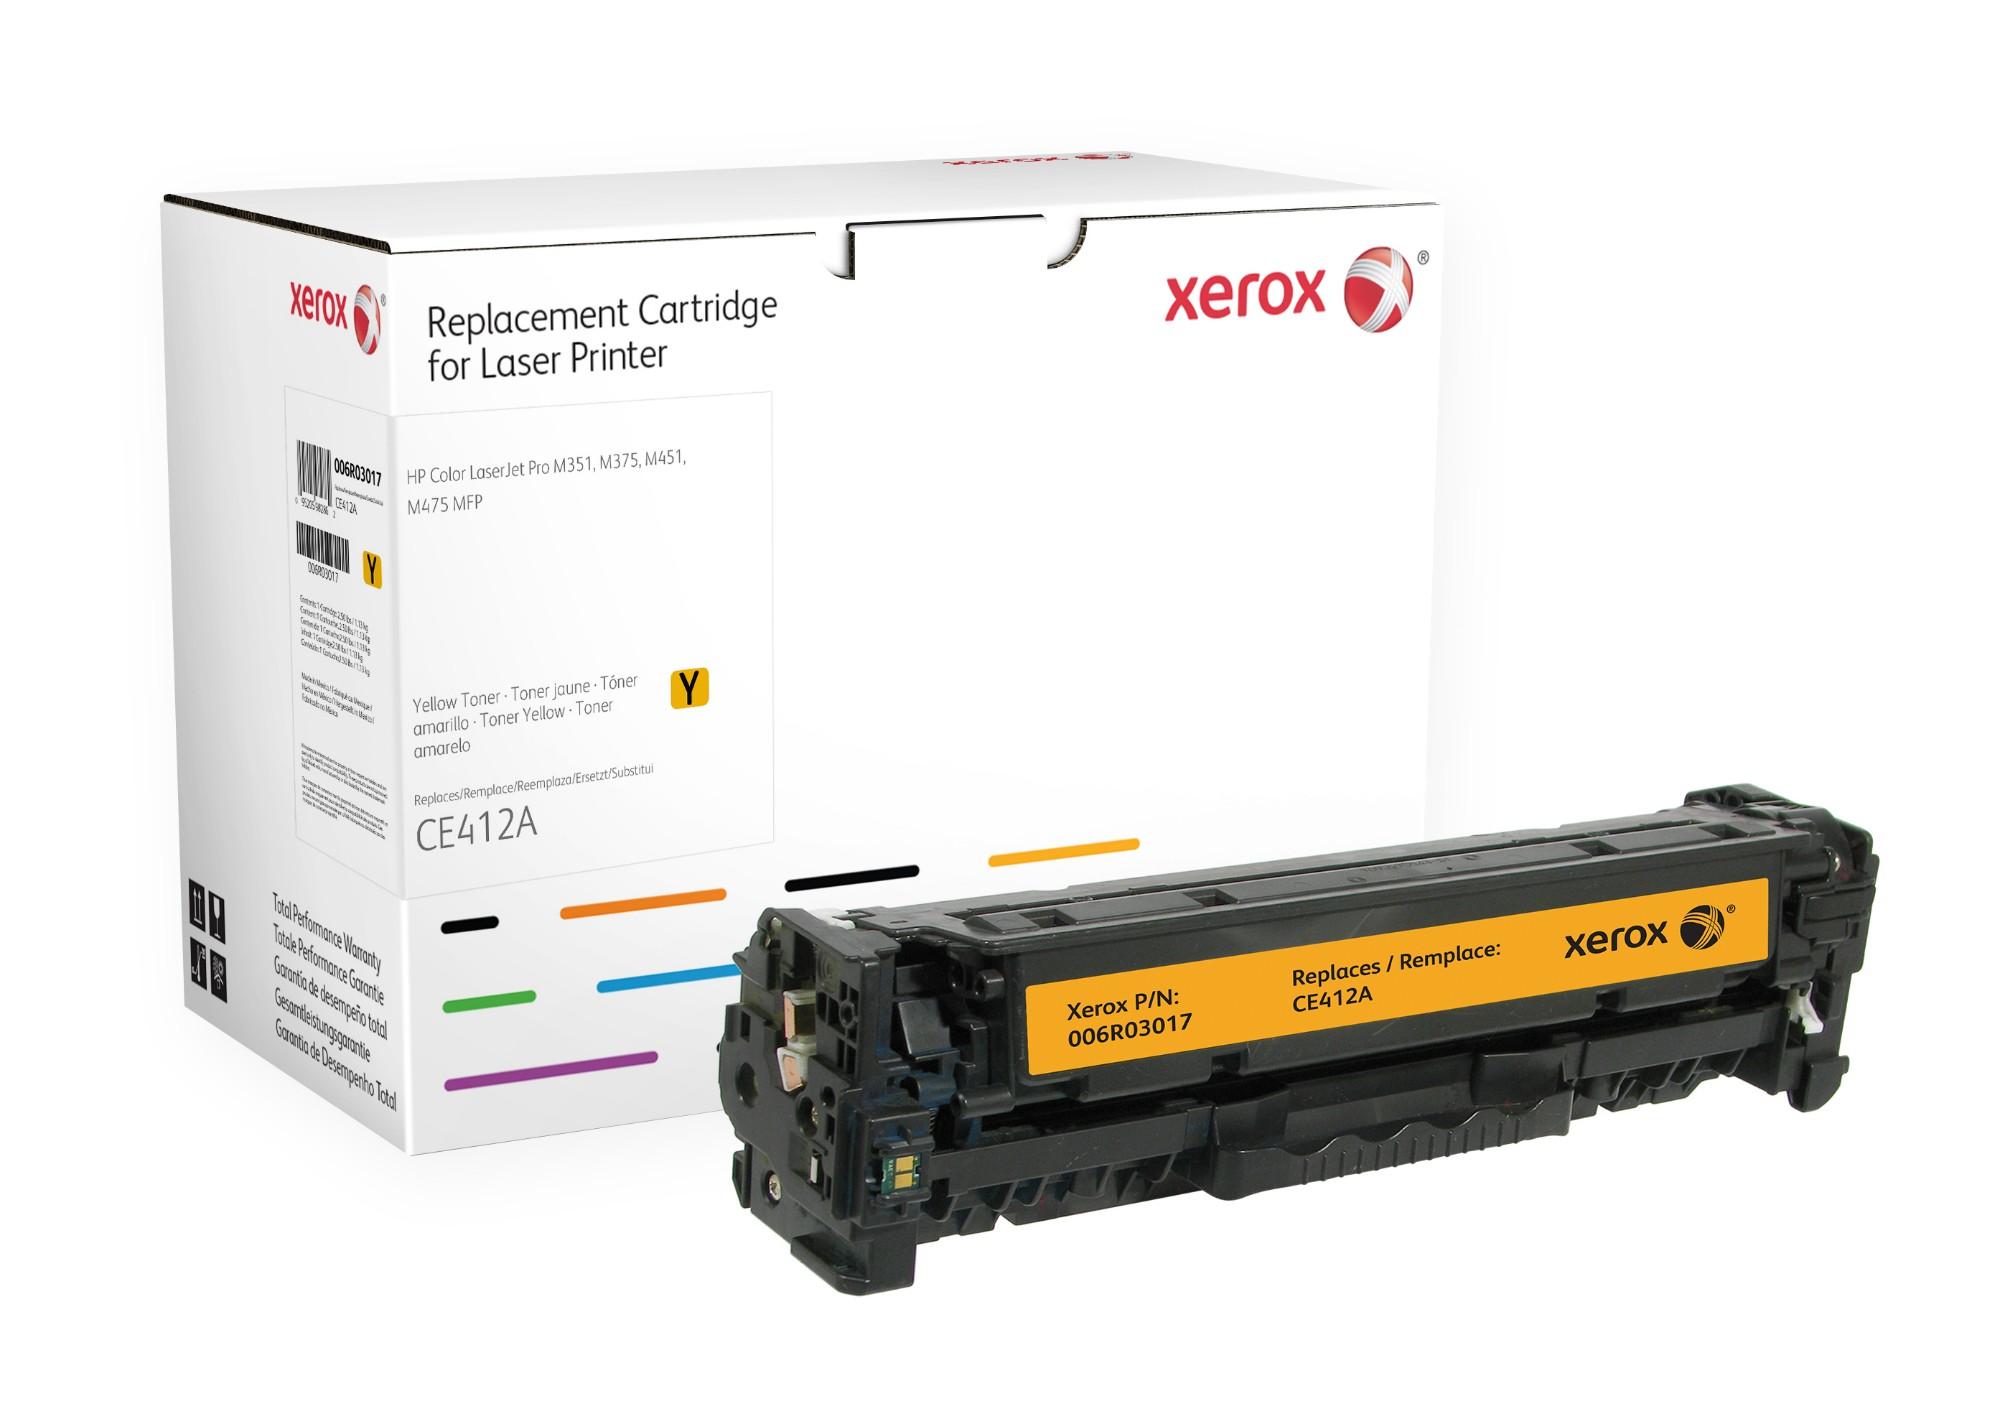 Xerox Cartucho de tóner amarillo. Equivalente a HP CE412A. Compatible con HP Colour LaserJet M351A, Colour LaserJet M375MFP, Colour LaserJet M451, Colour LaserJet M475 MFP